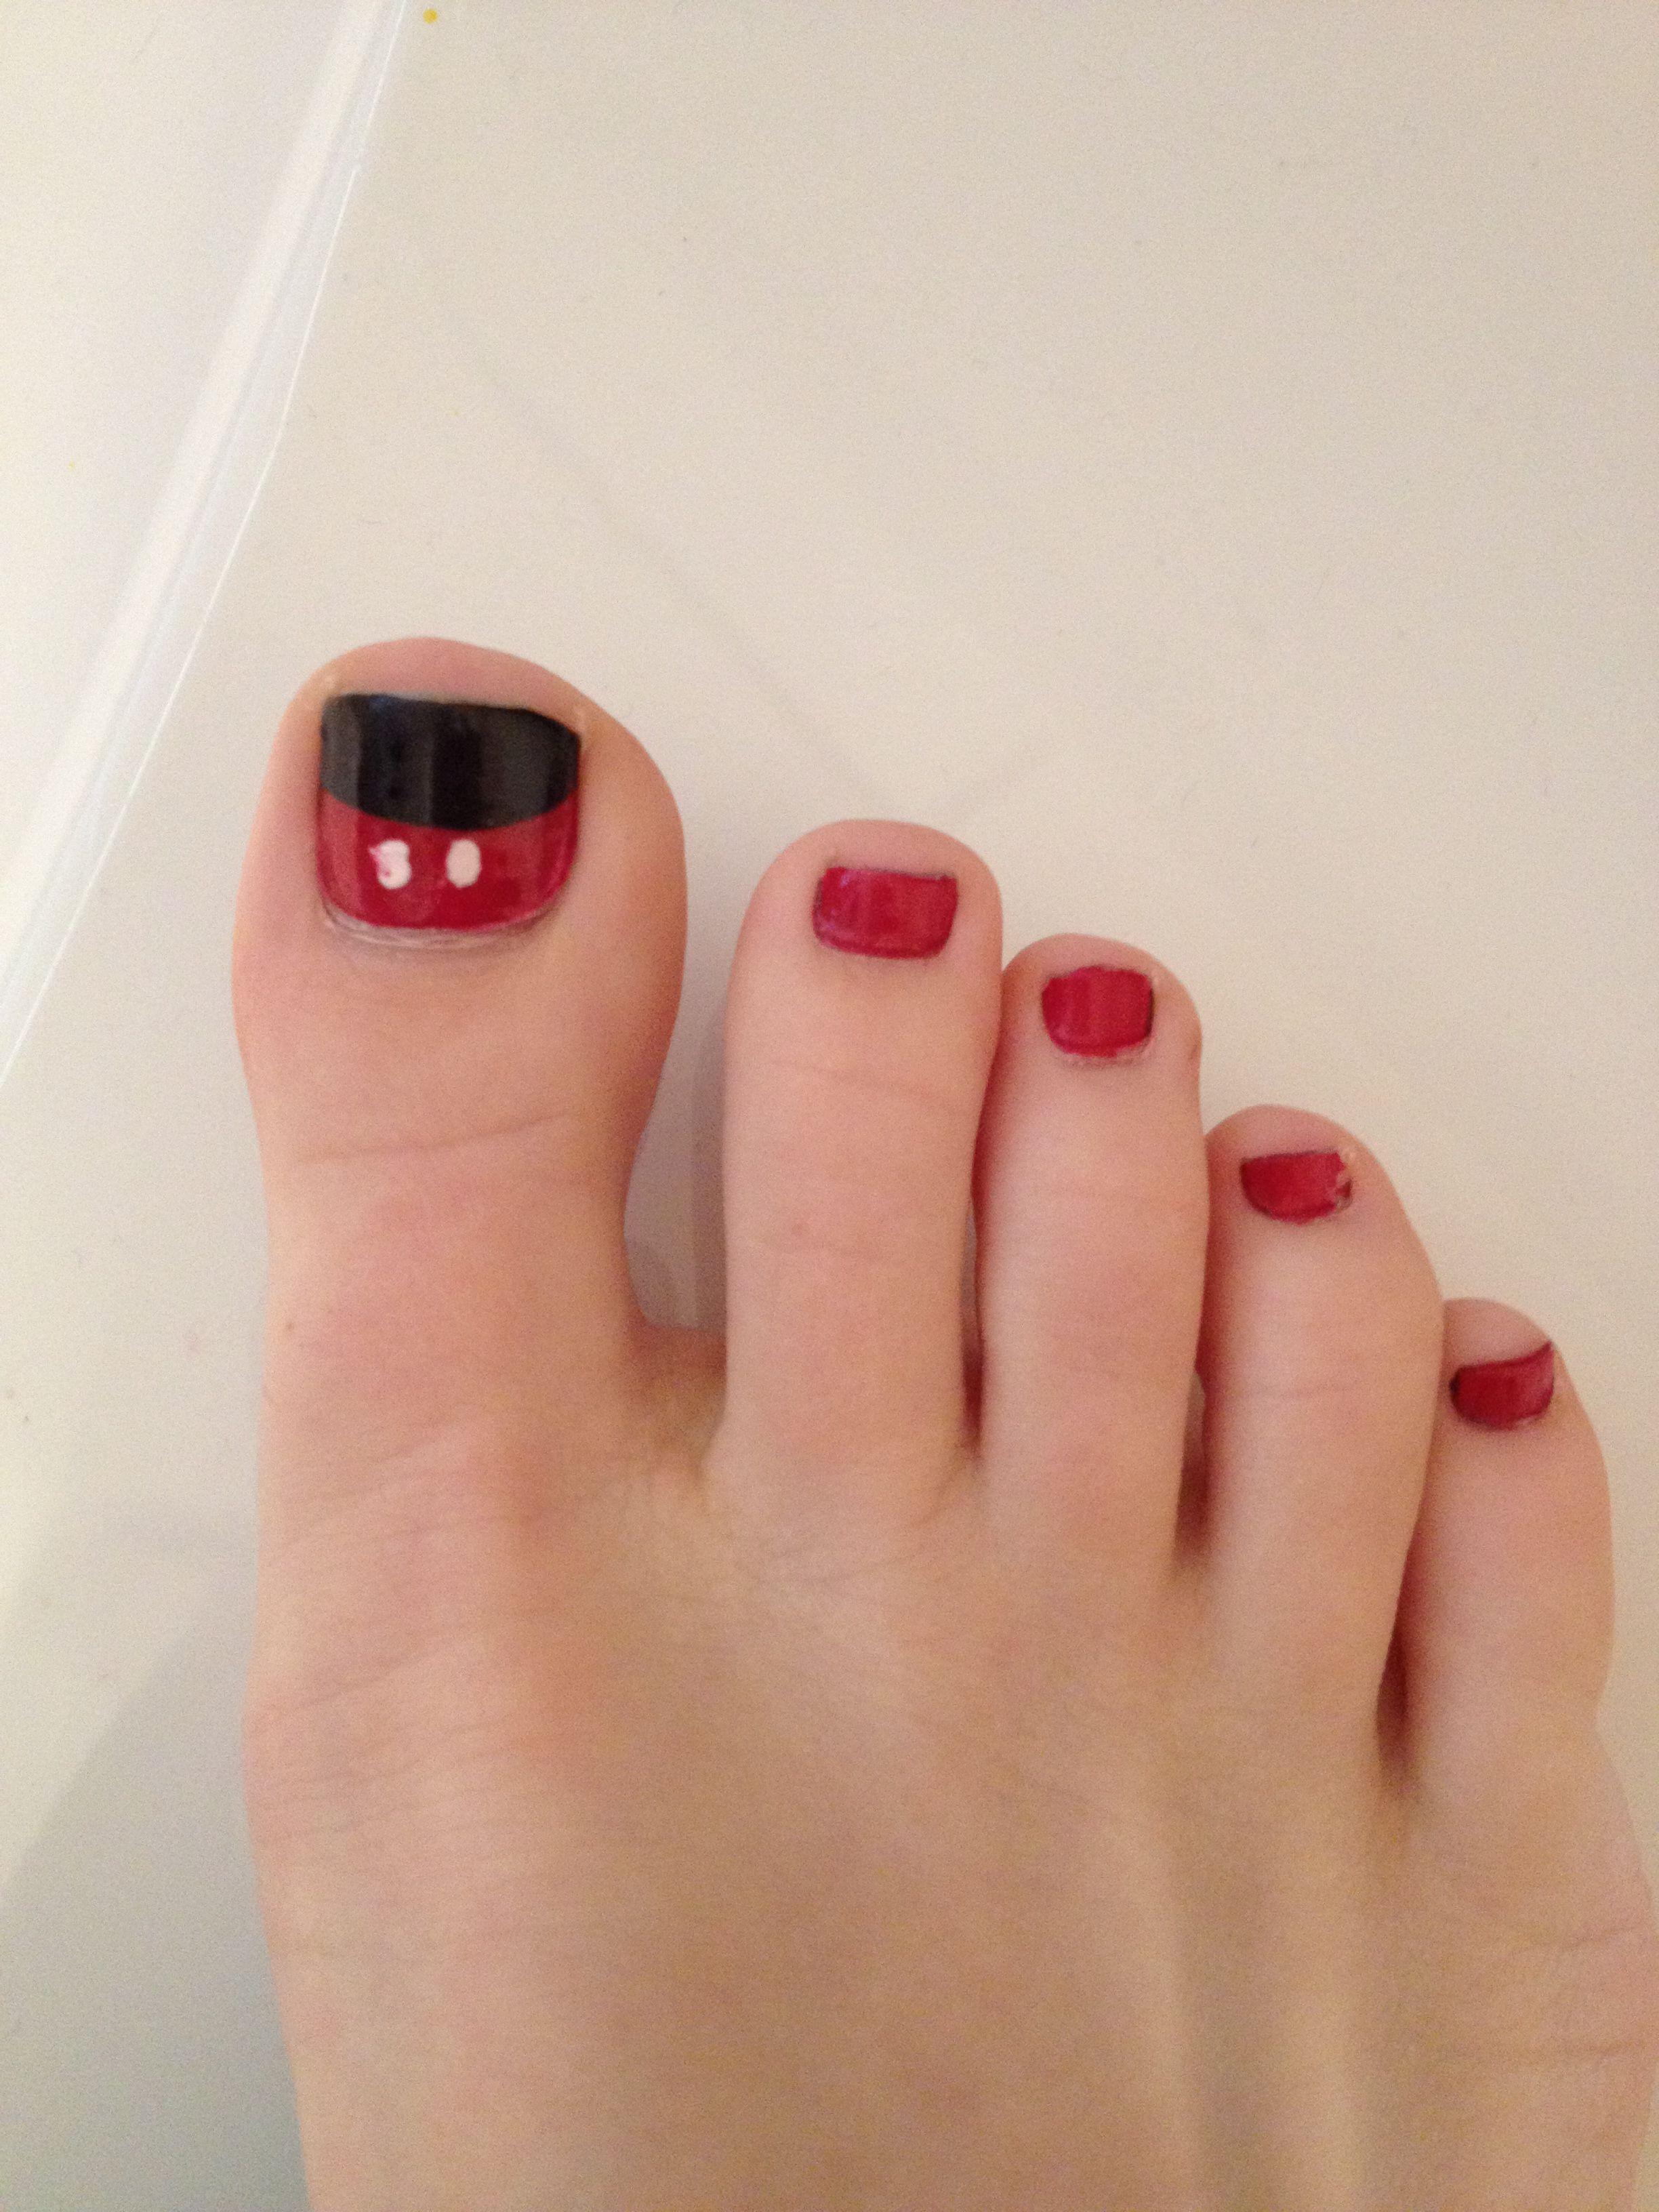 Mickey Mouse toenails | Make up | Pinterest